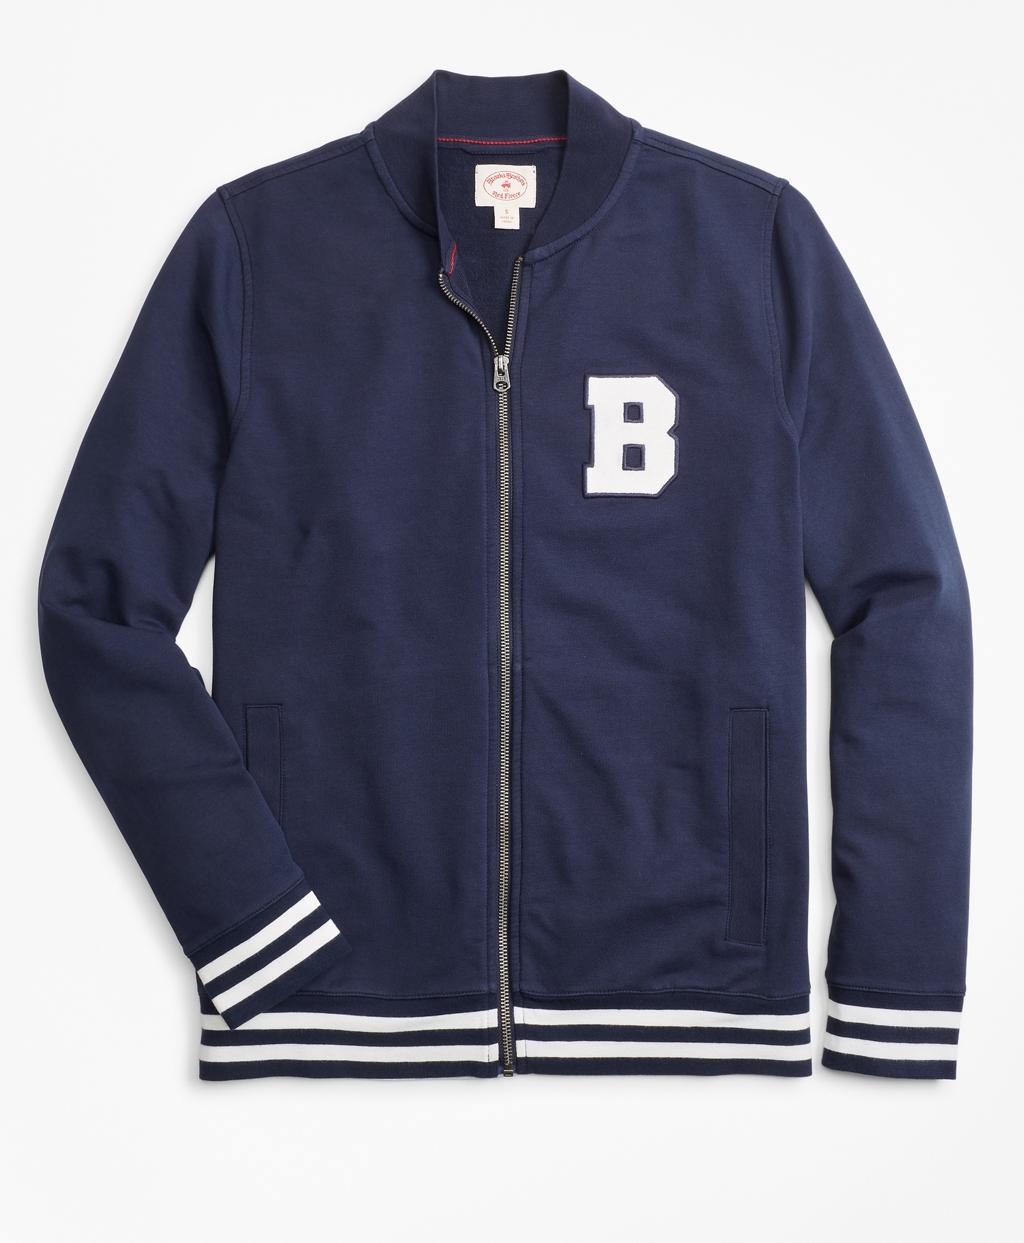 50s Men's Jackets| Greaser Jackets, Leather, Bomber, Gaberdine Brooks Brothers Mens French Terry Letterman Lightweight Baseball Jacket $39.75 AT vintagedancer.com